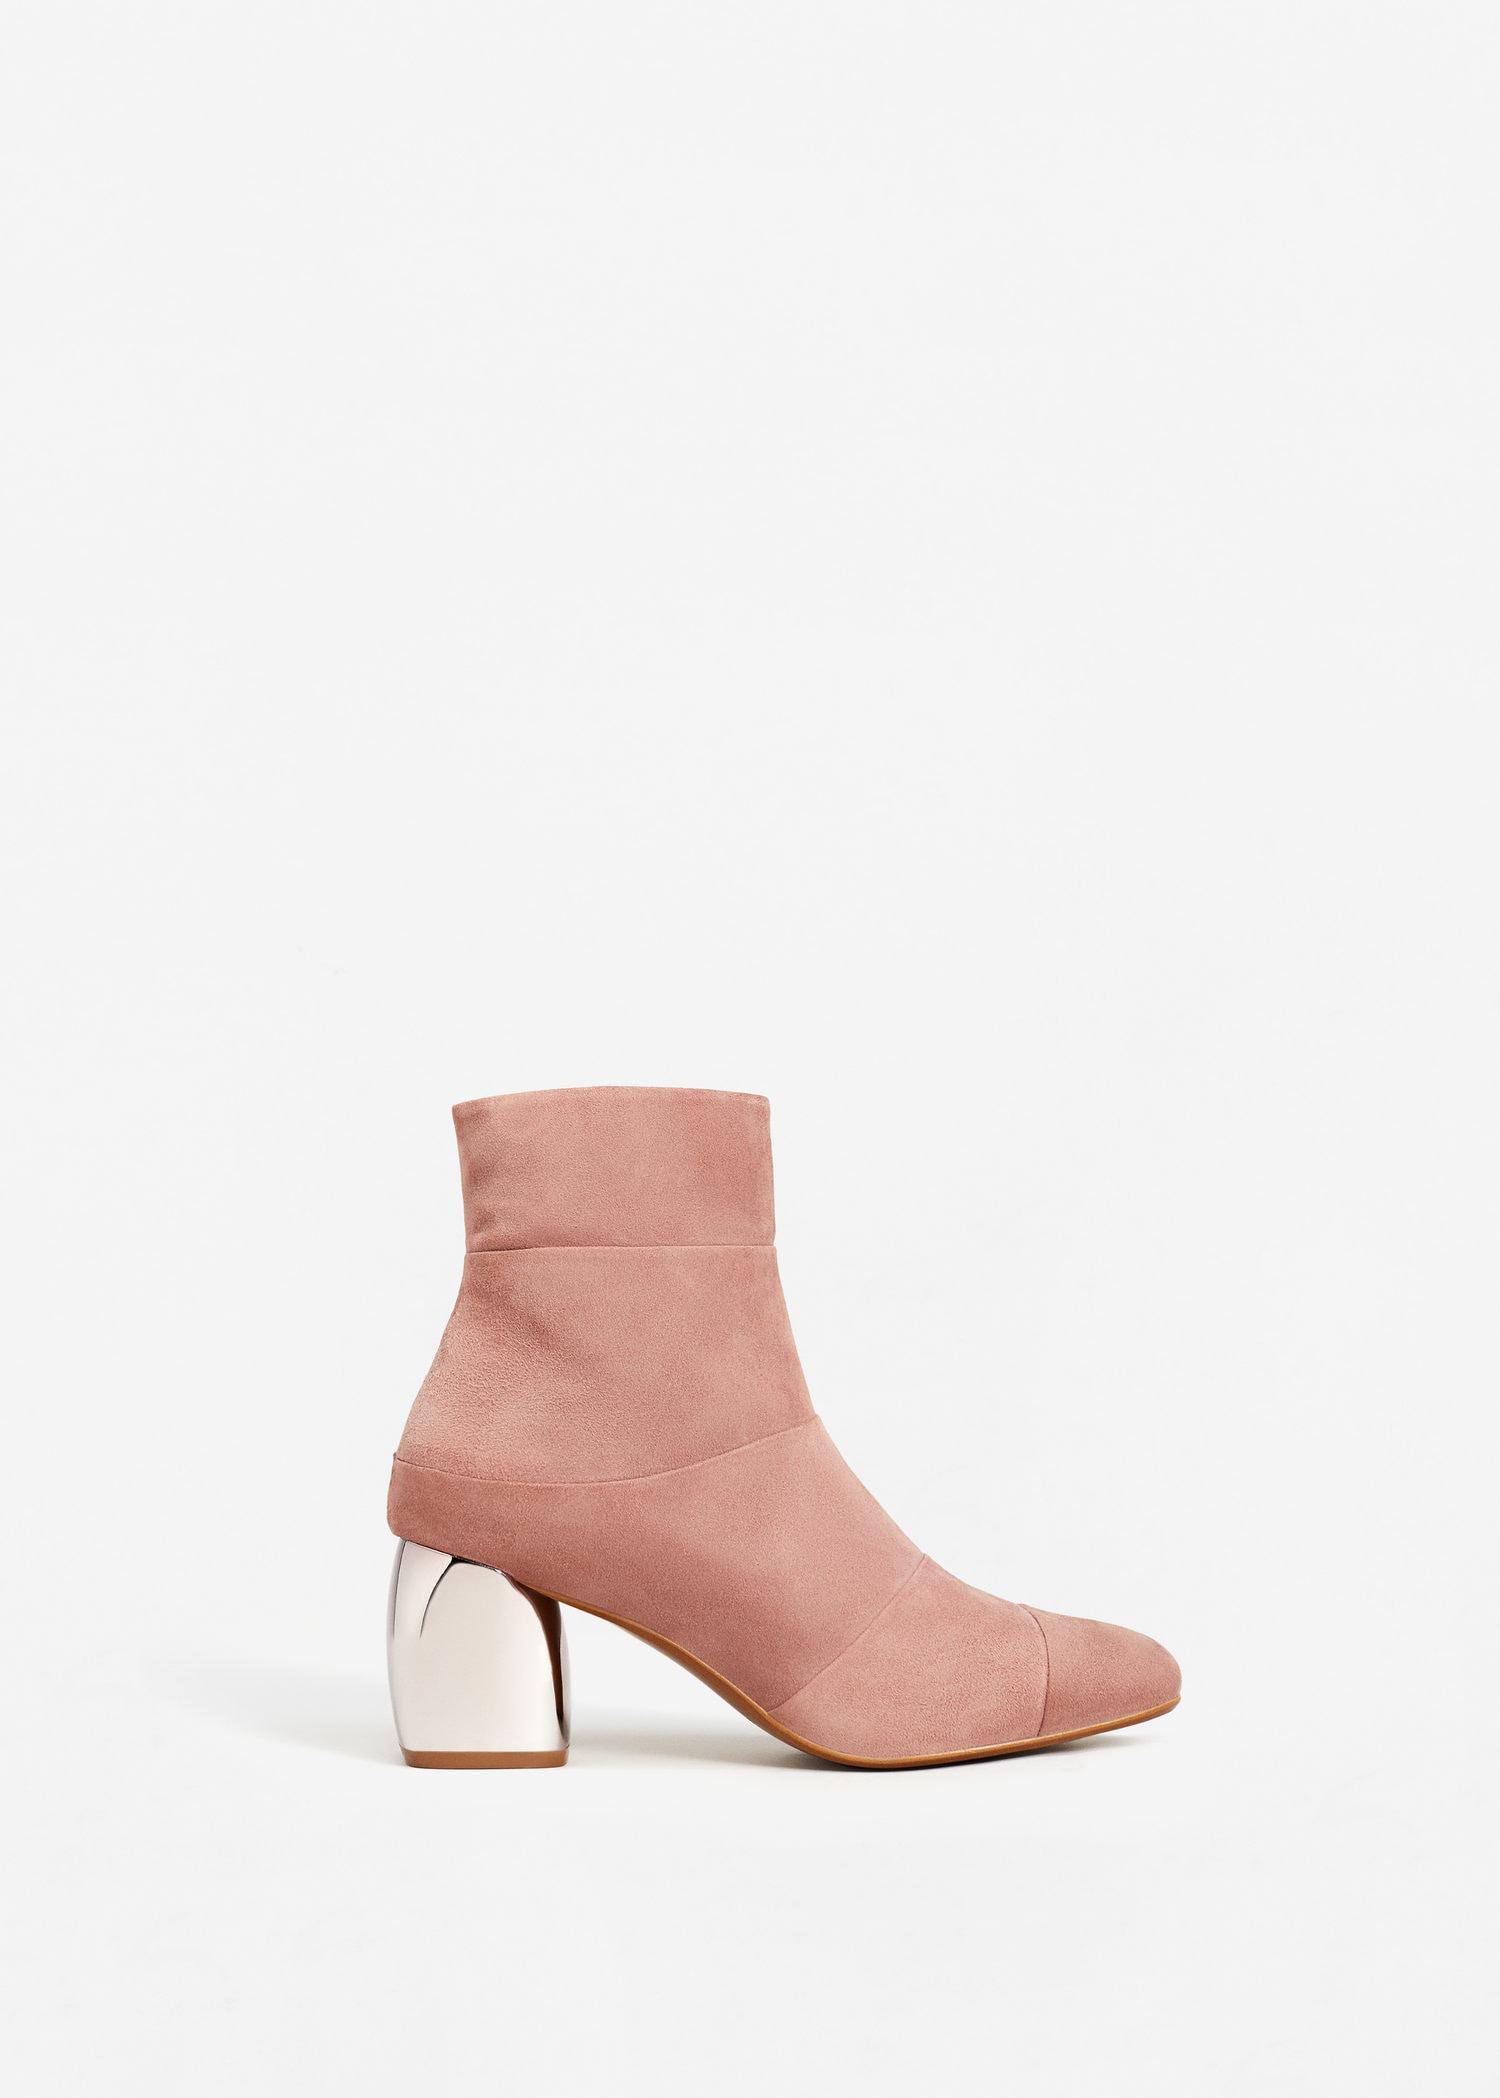 ca86b4bdf35 Mango Pink Mirror Heel Suede Ankle Boots